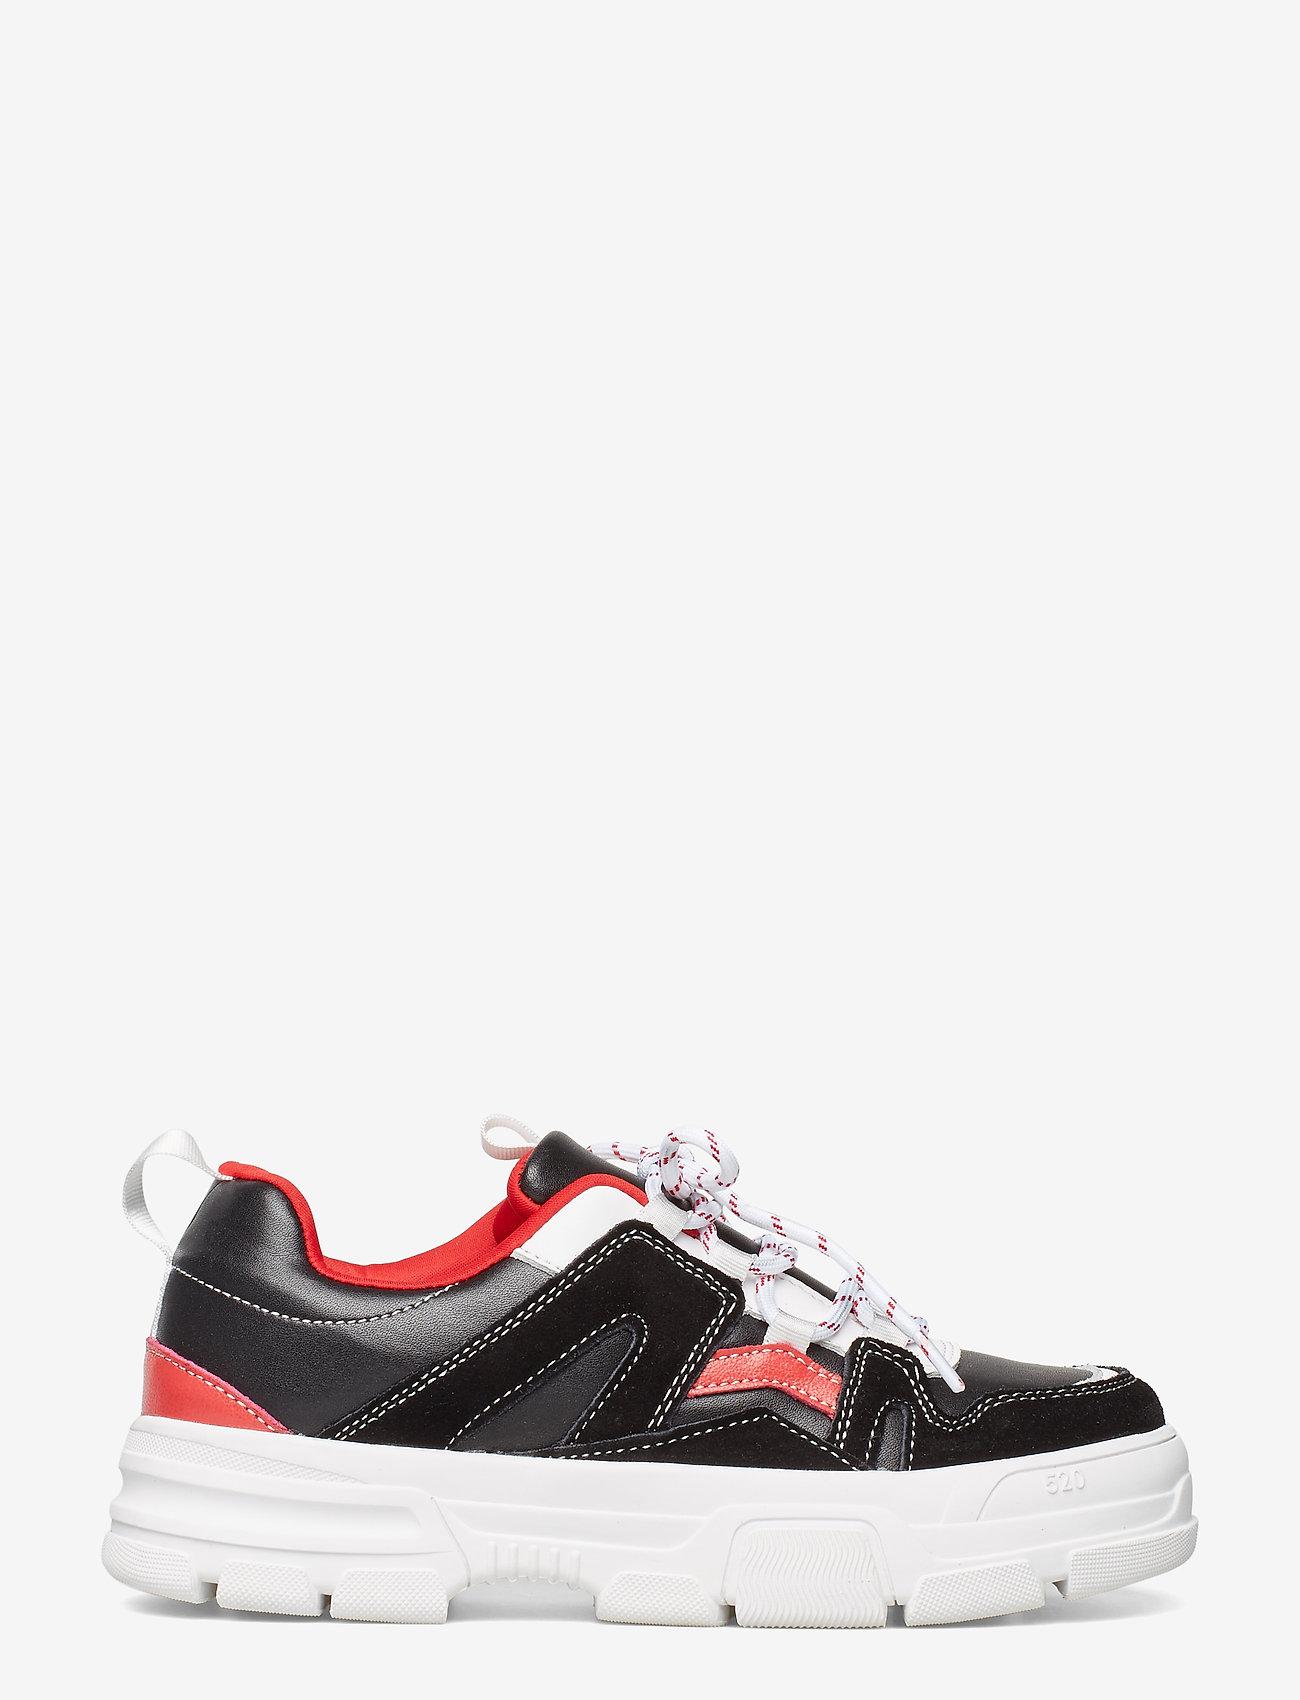 Särskild rabattGwen Mix White/black 779.40 Shoe The Bear kWtto 6ak62